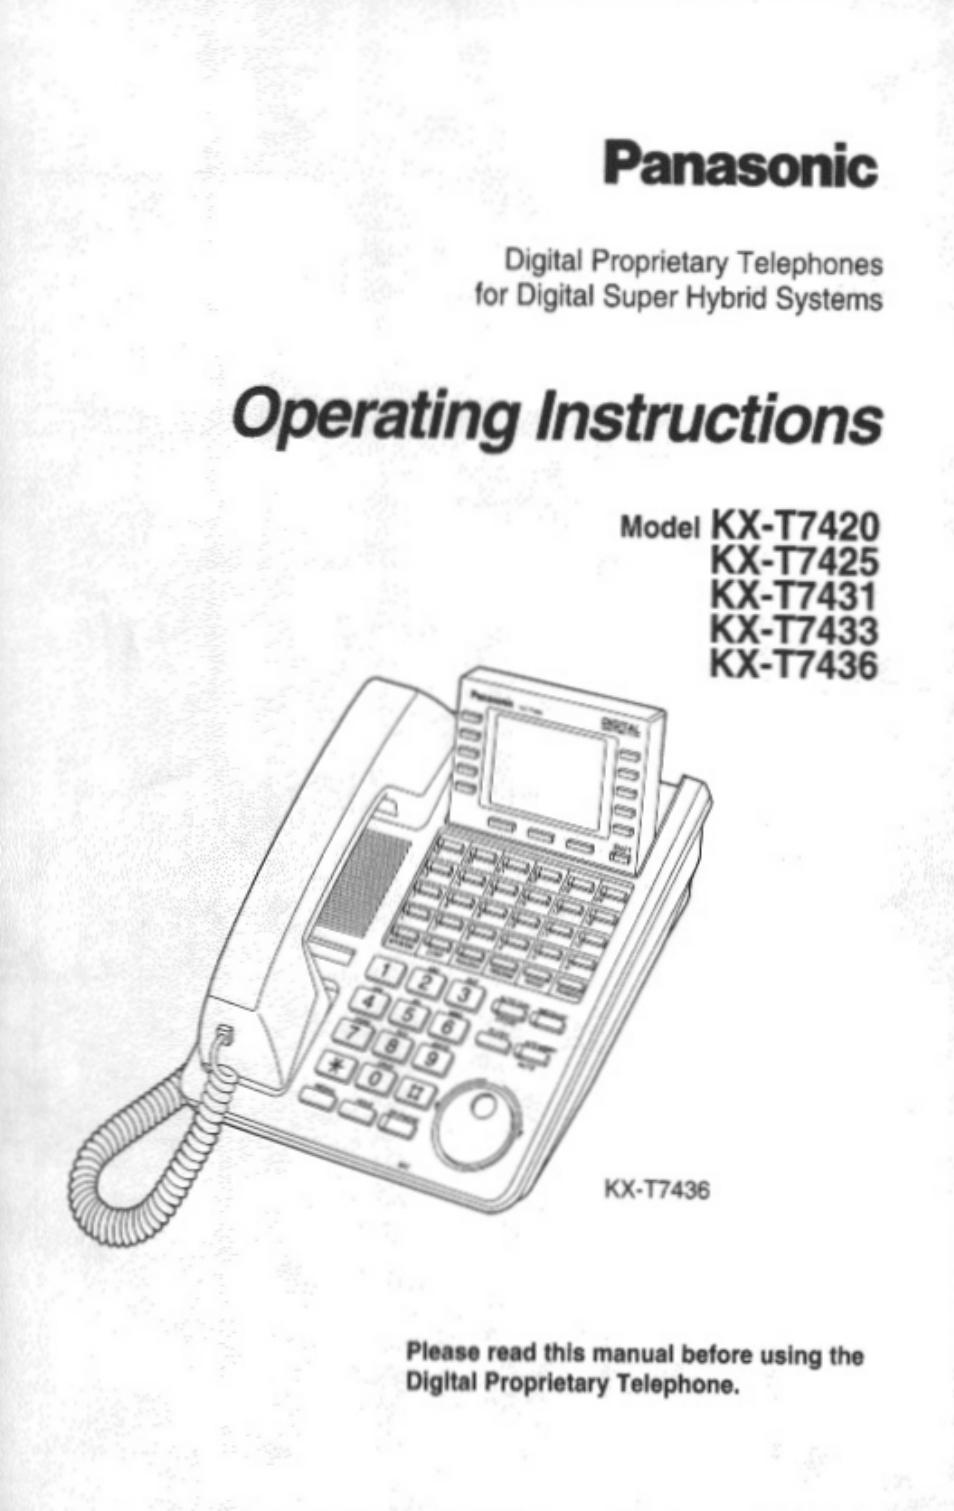 Panasonic kx-t7433 manuals.